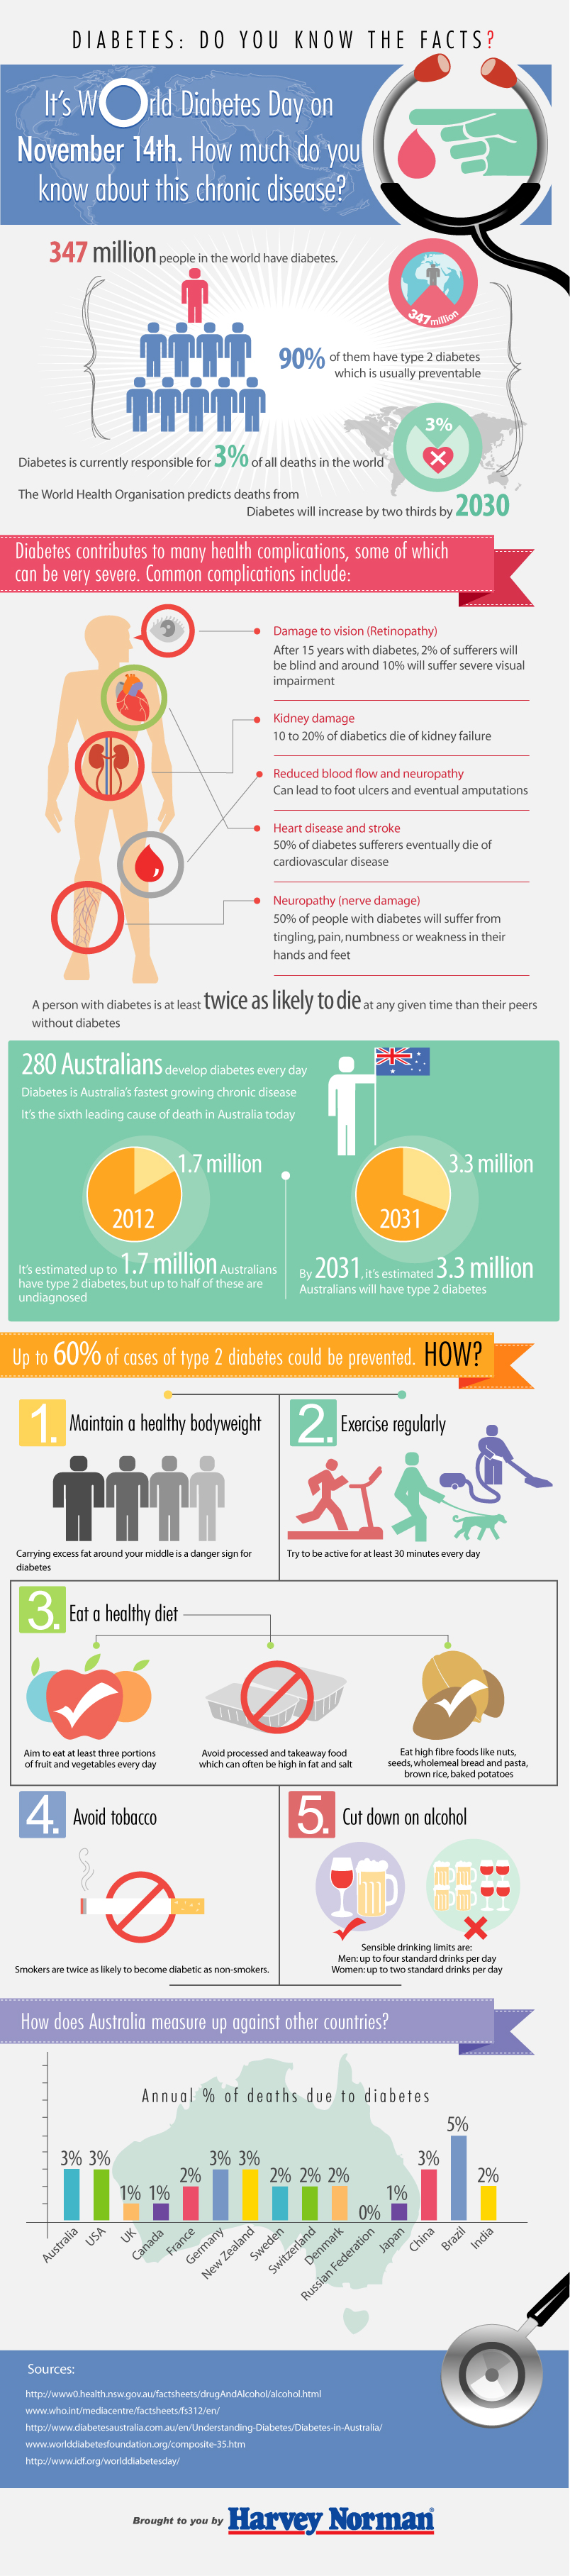 world-diabetes-day_50a195f7977cb